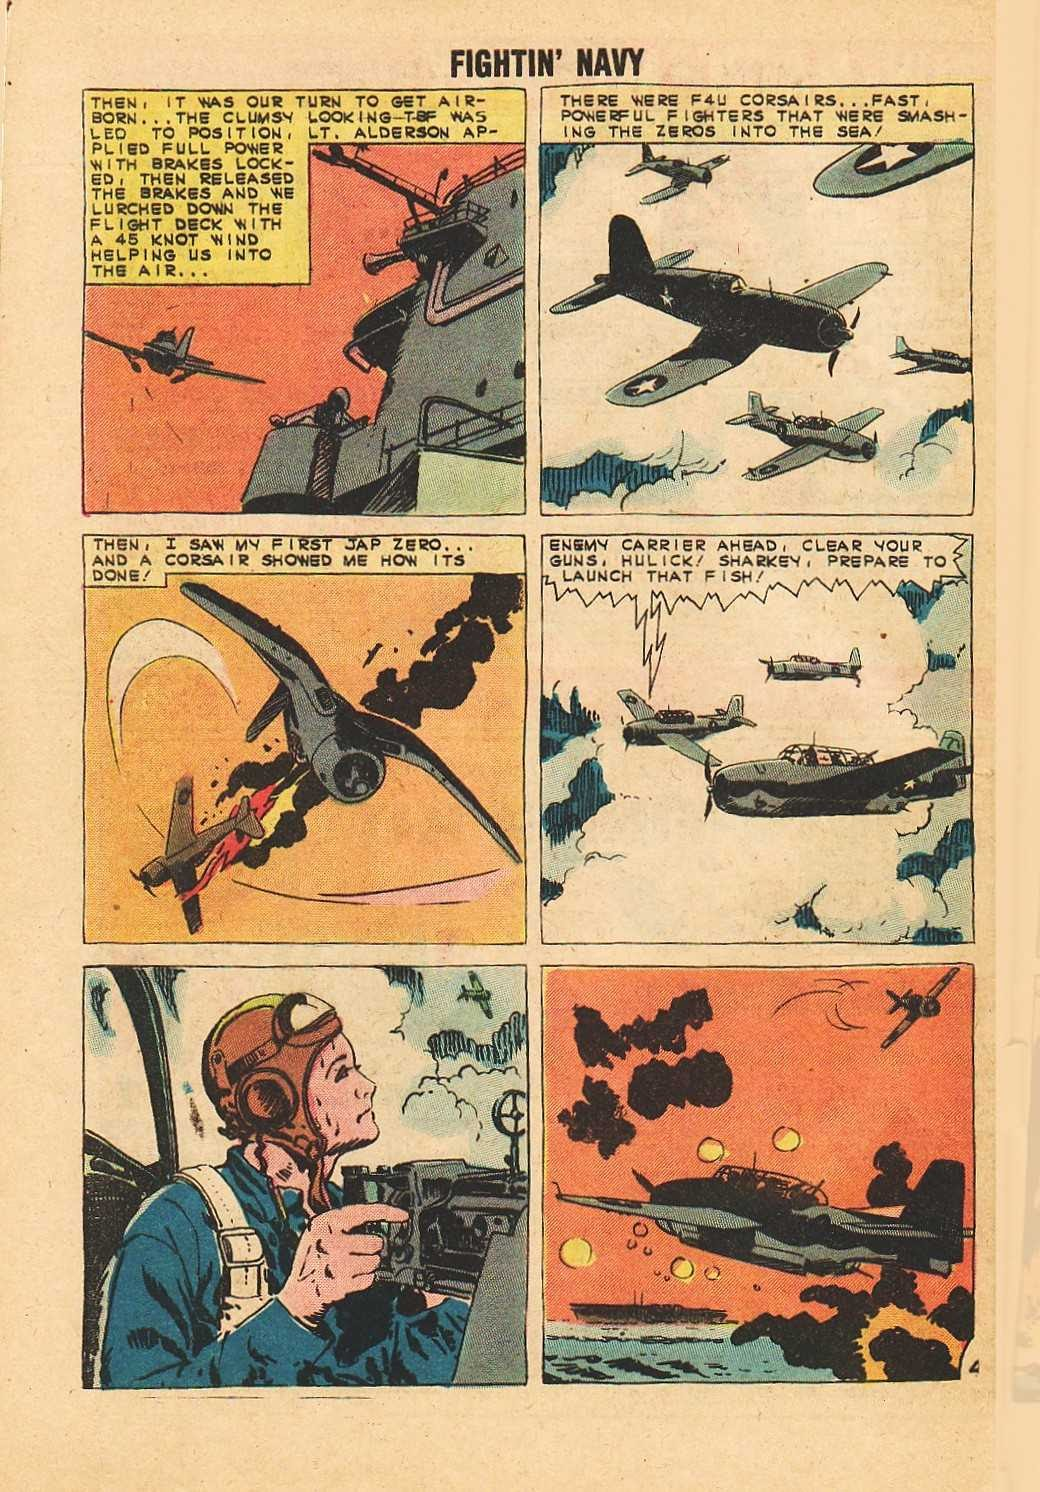 Read online Fightin' Navy comic -  Issue #113 - 32